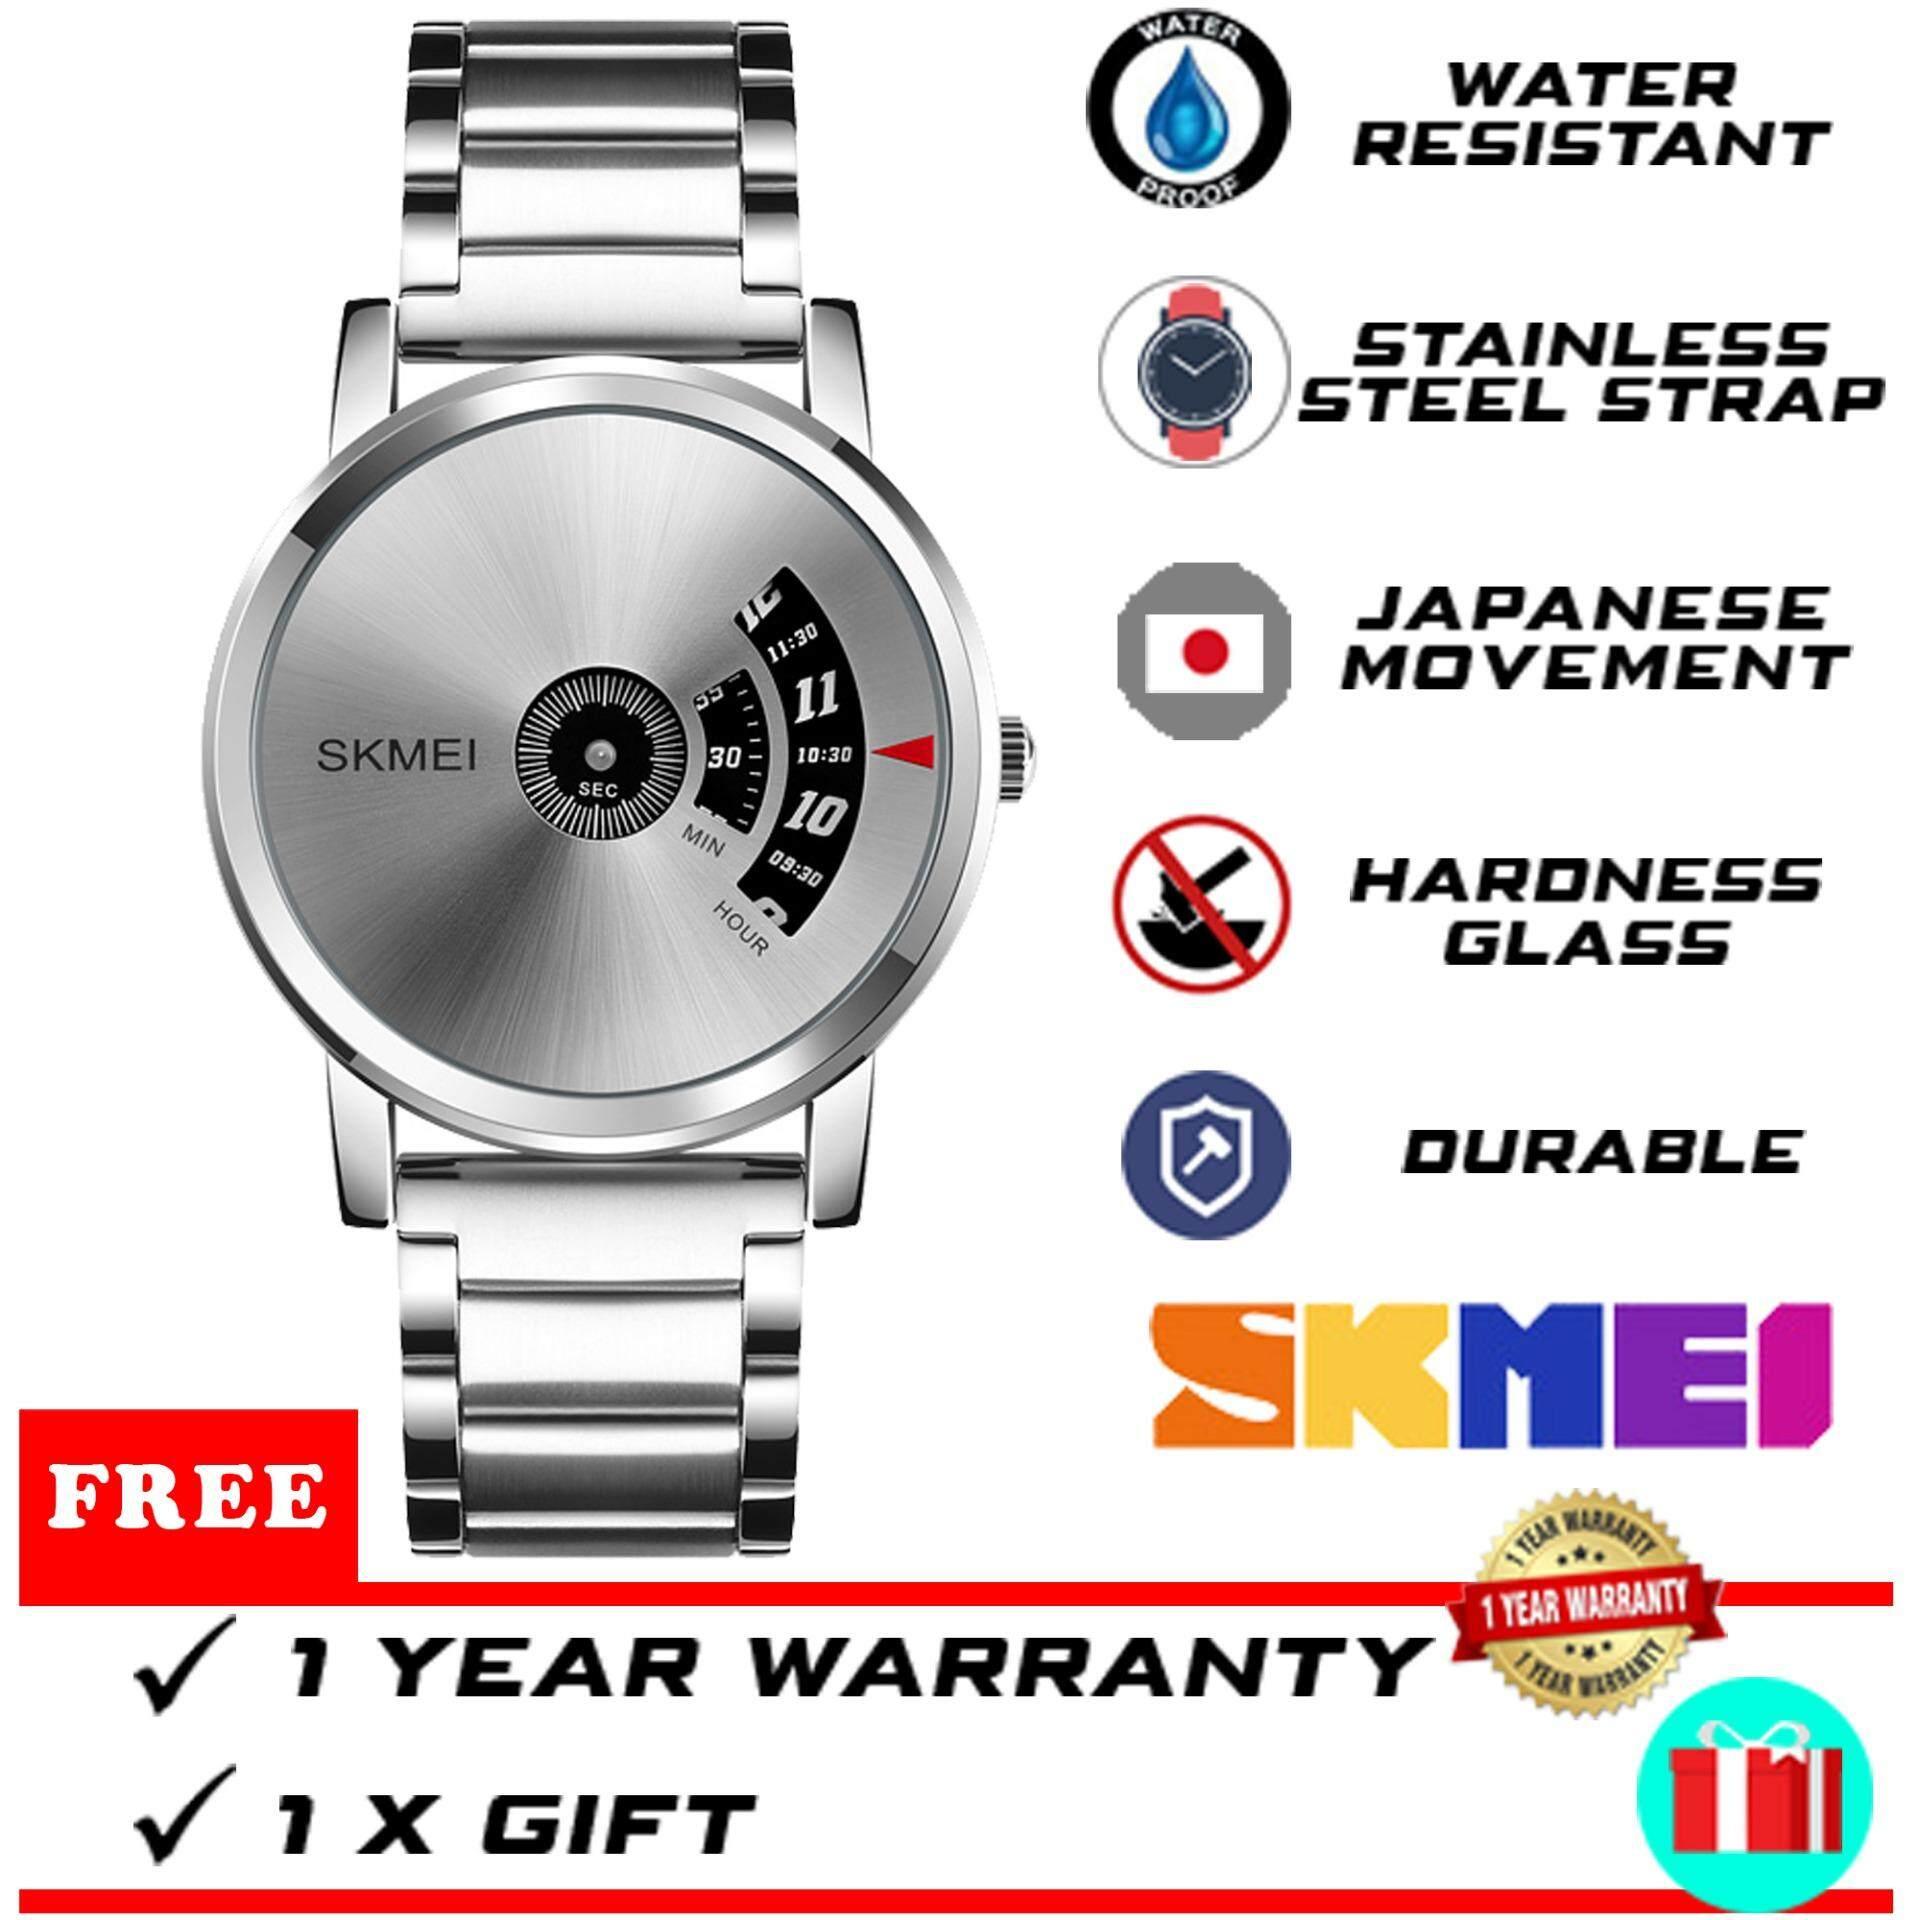 Original Brand SKMEI WTH-402 Fashion IP Black Plating Luxury Stainless Steel Waterproof Men Watch [FREE GIFT & READY STOCK] Malaysia